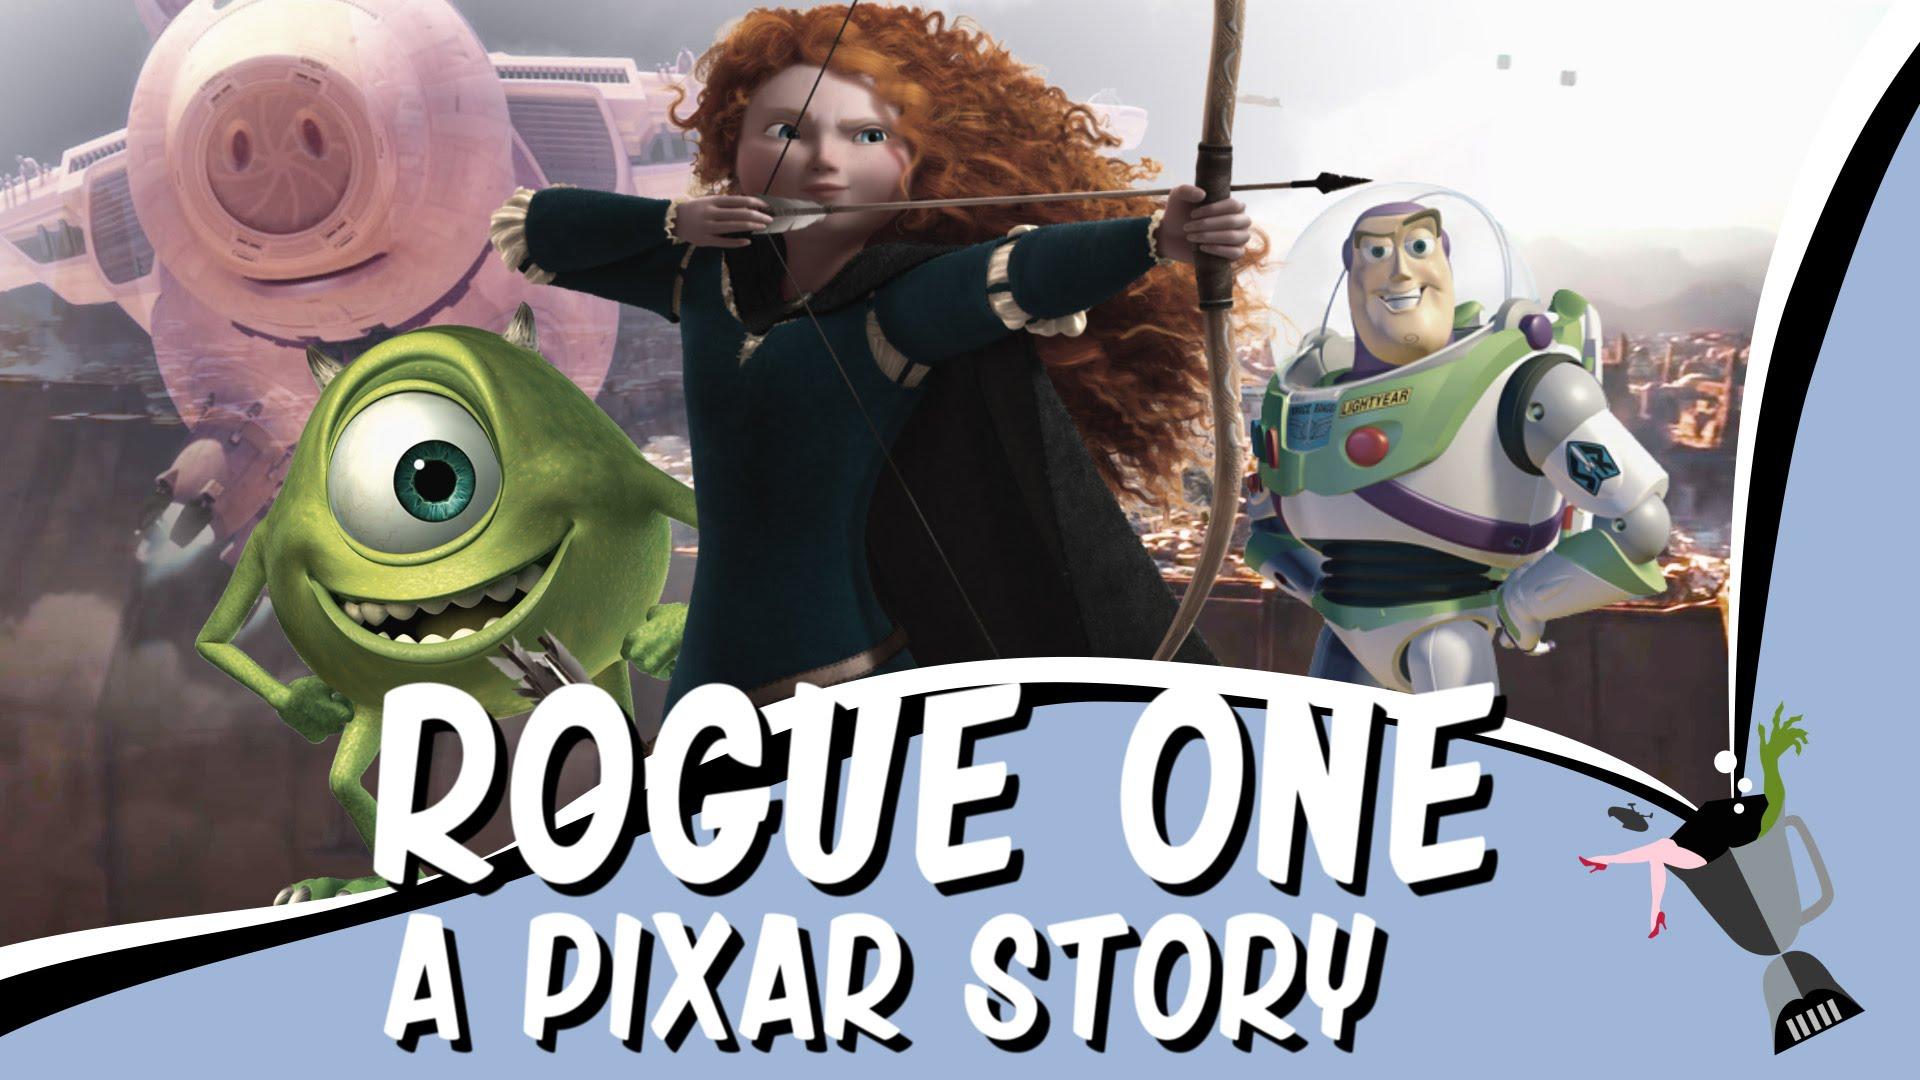 rogue-one-a-pixar-story